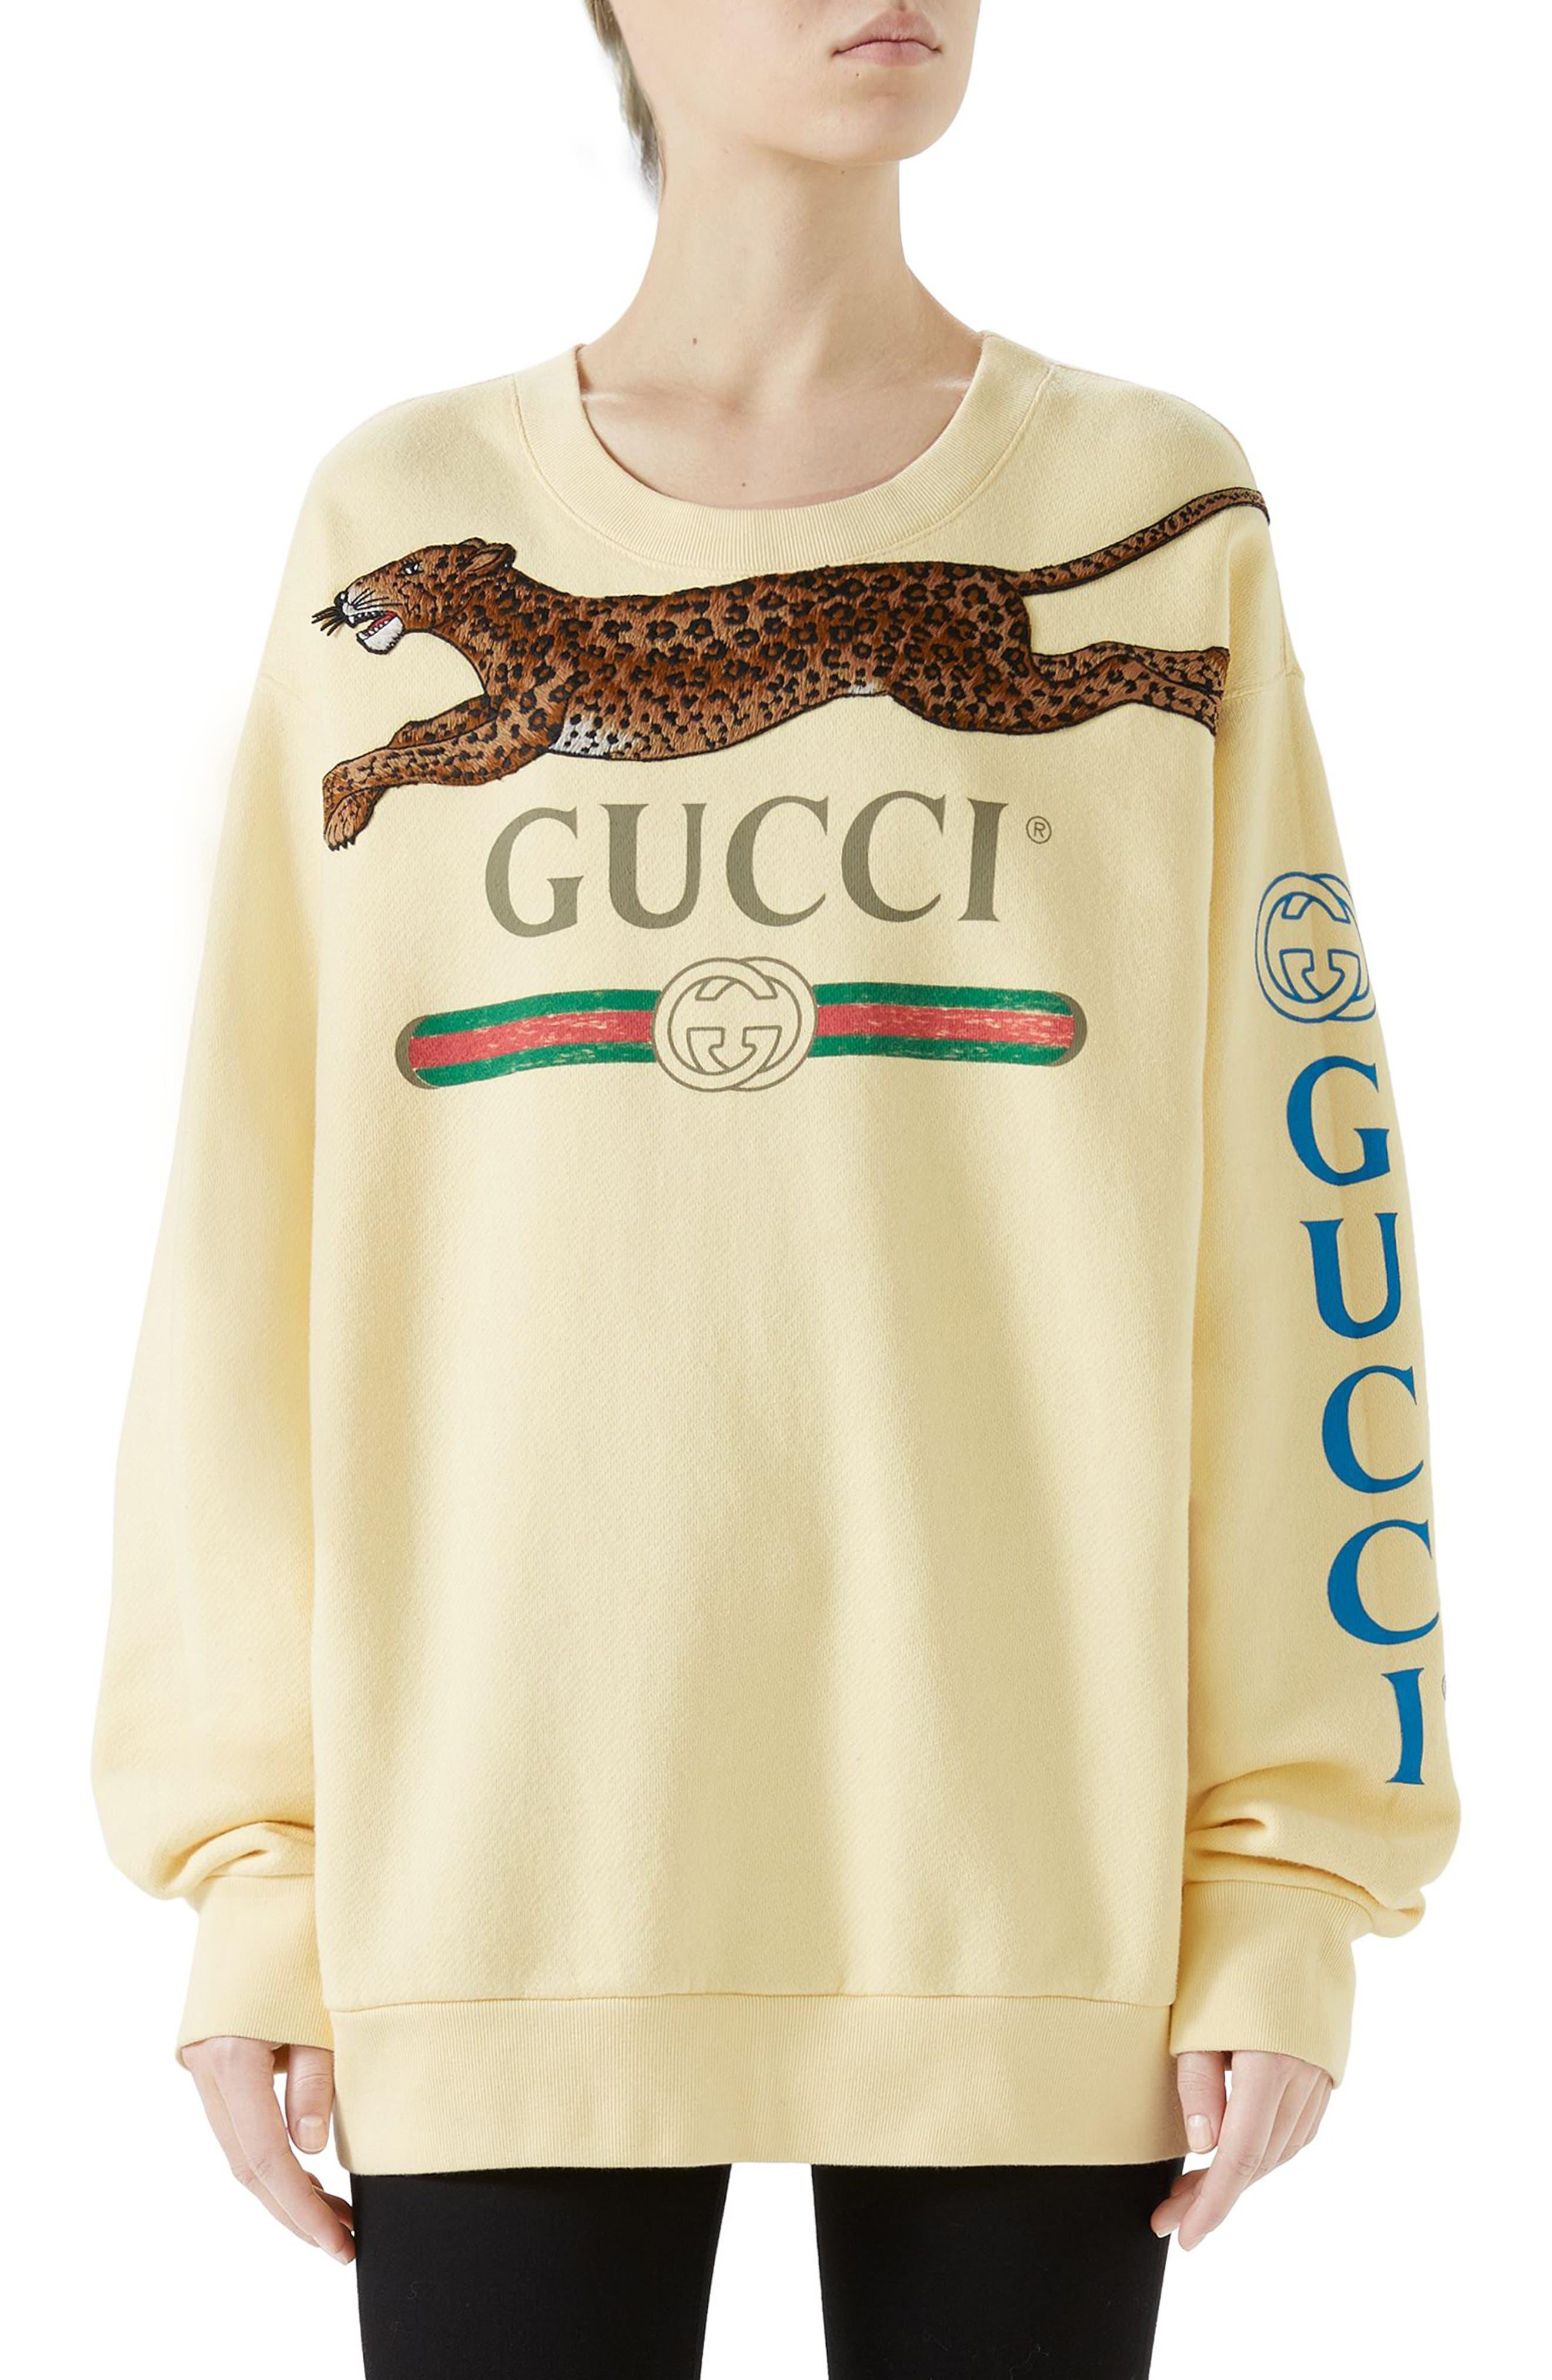 Gucci Leopard Detail Logo Sweatshirt